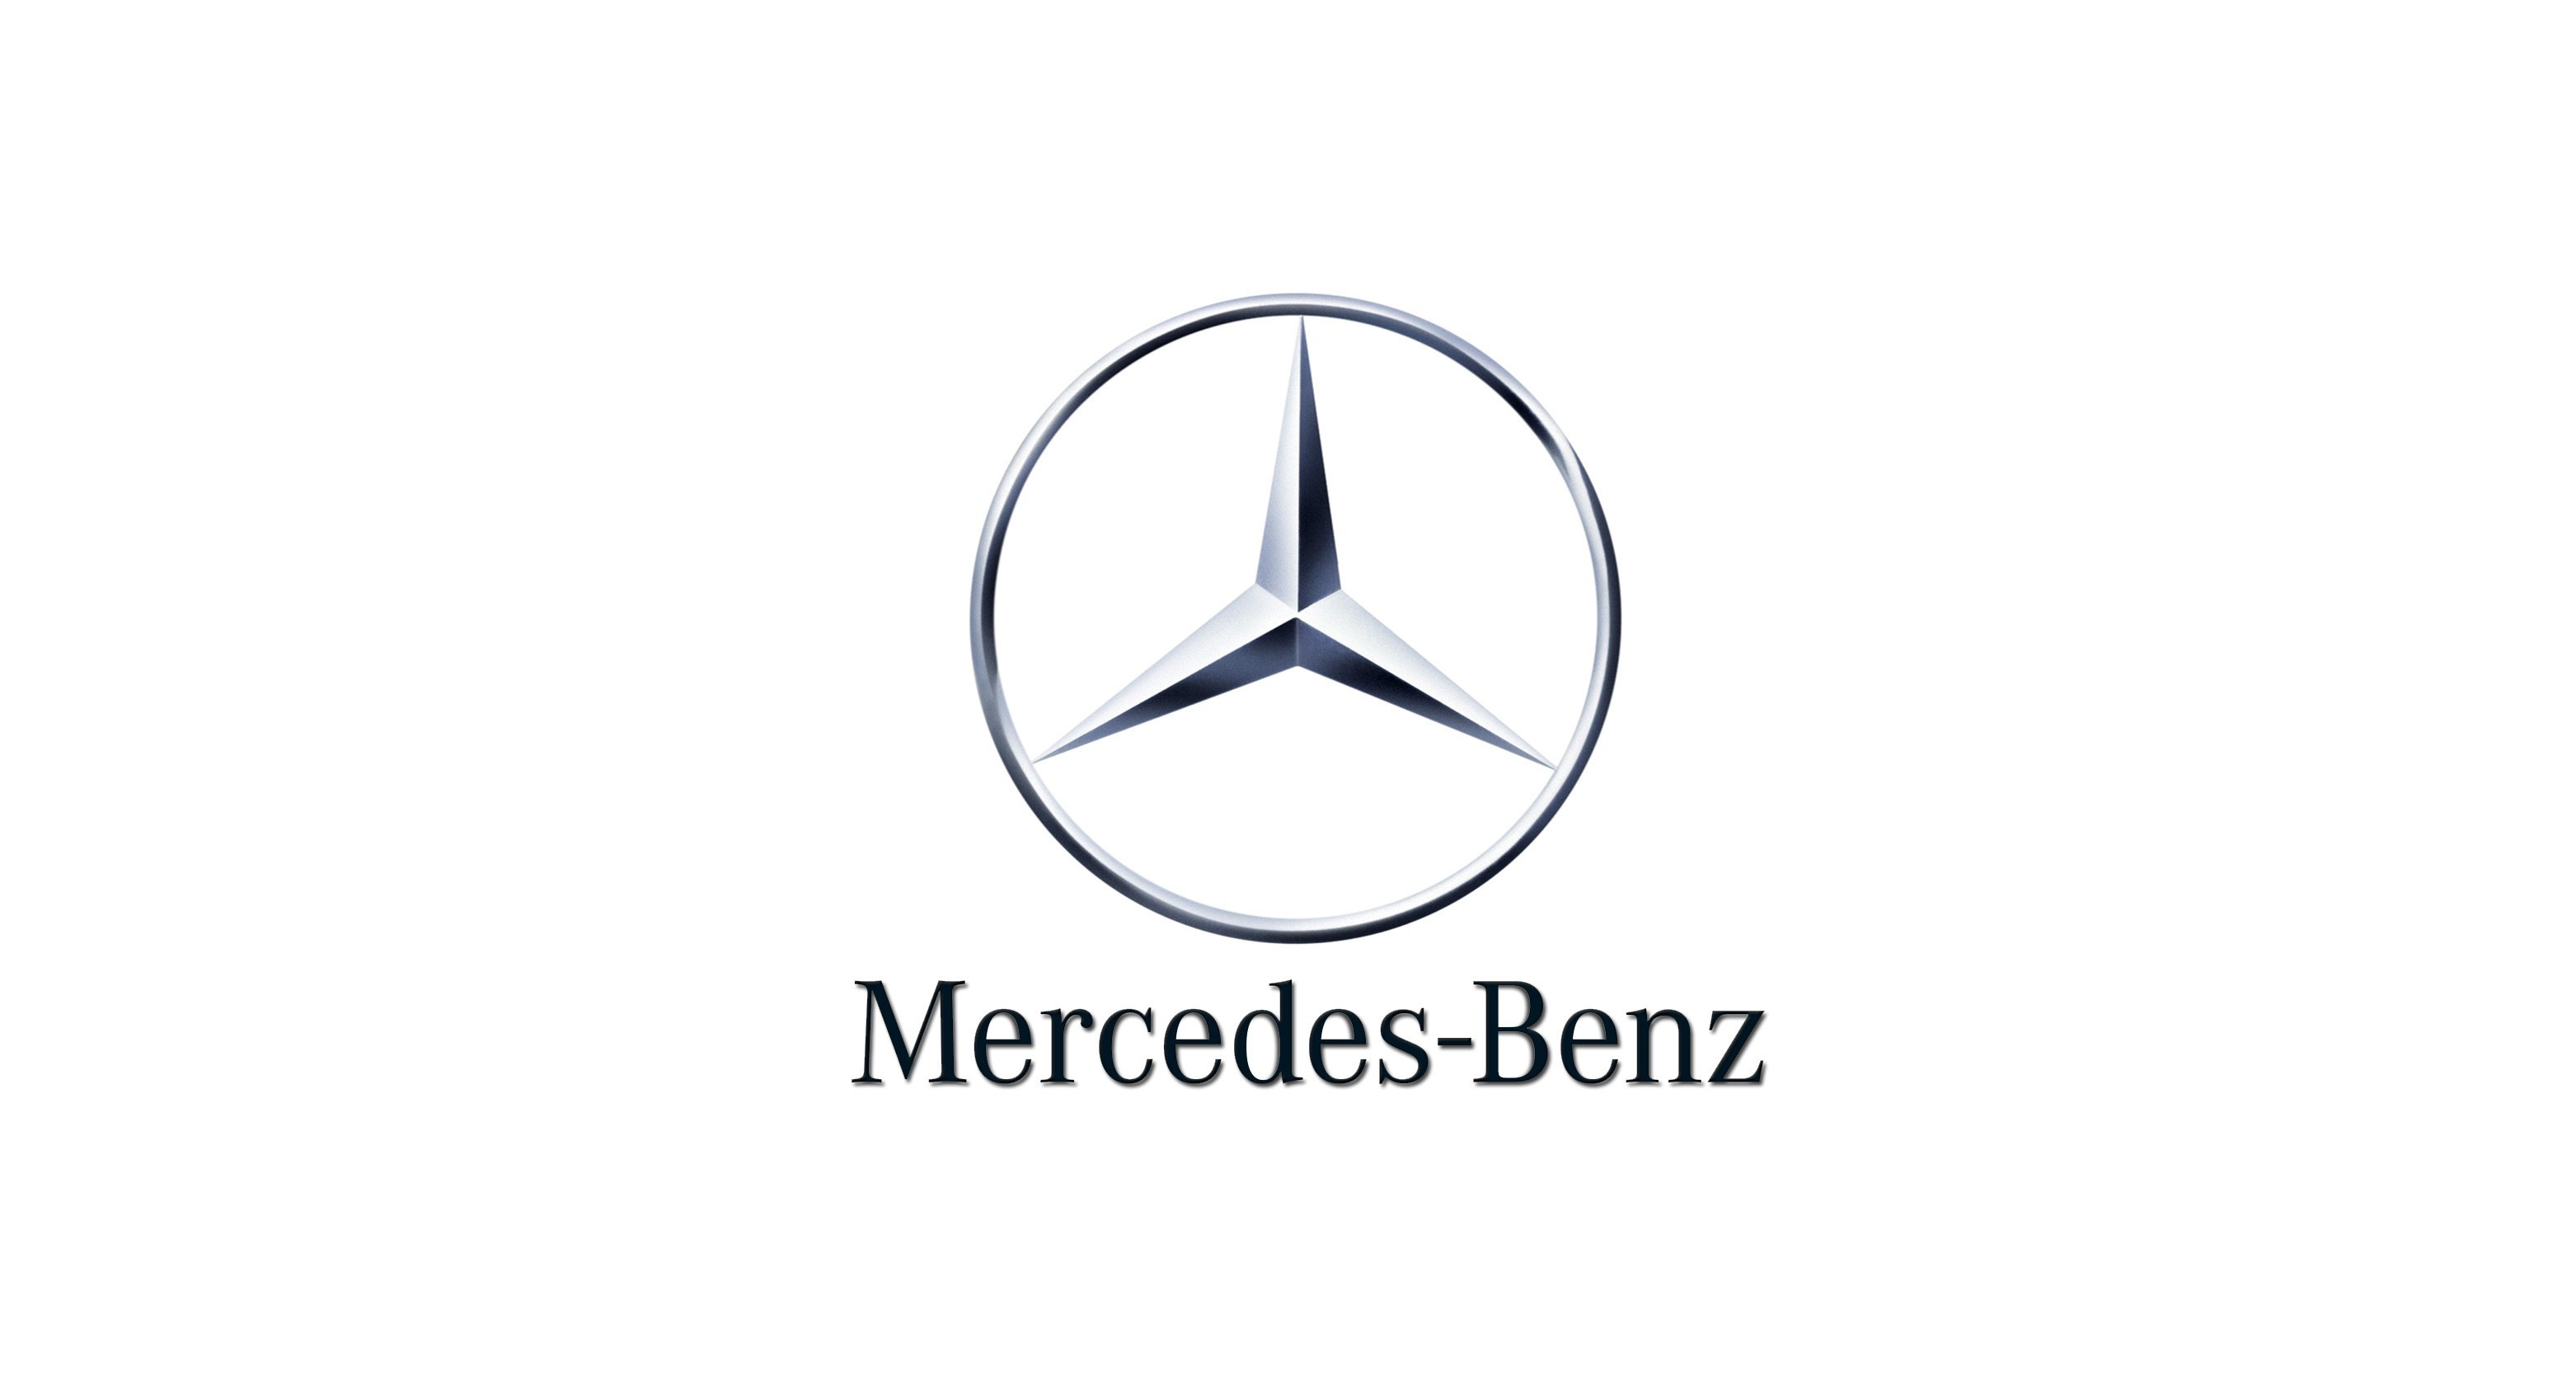 Lambang chelsea wallpaper 2018 69 images for Mercedes benz badge